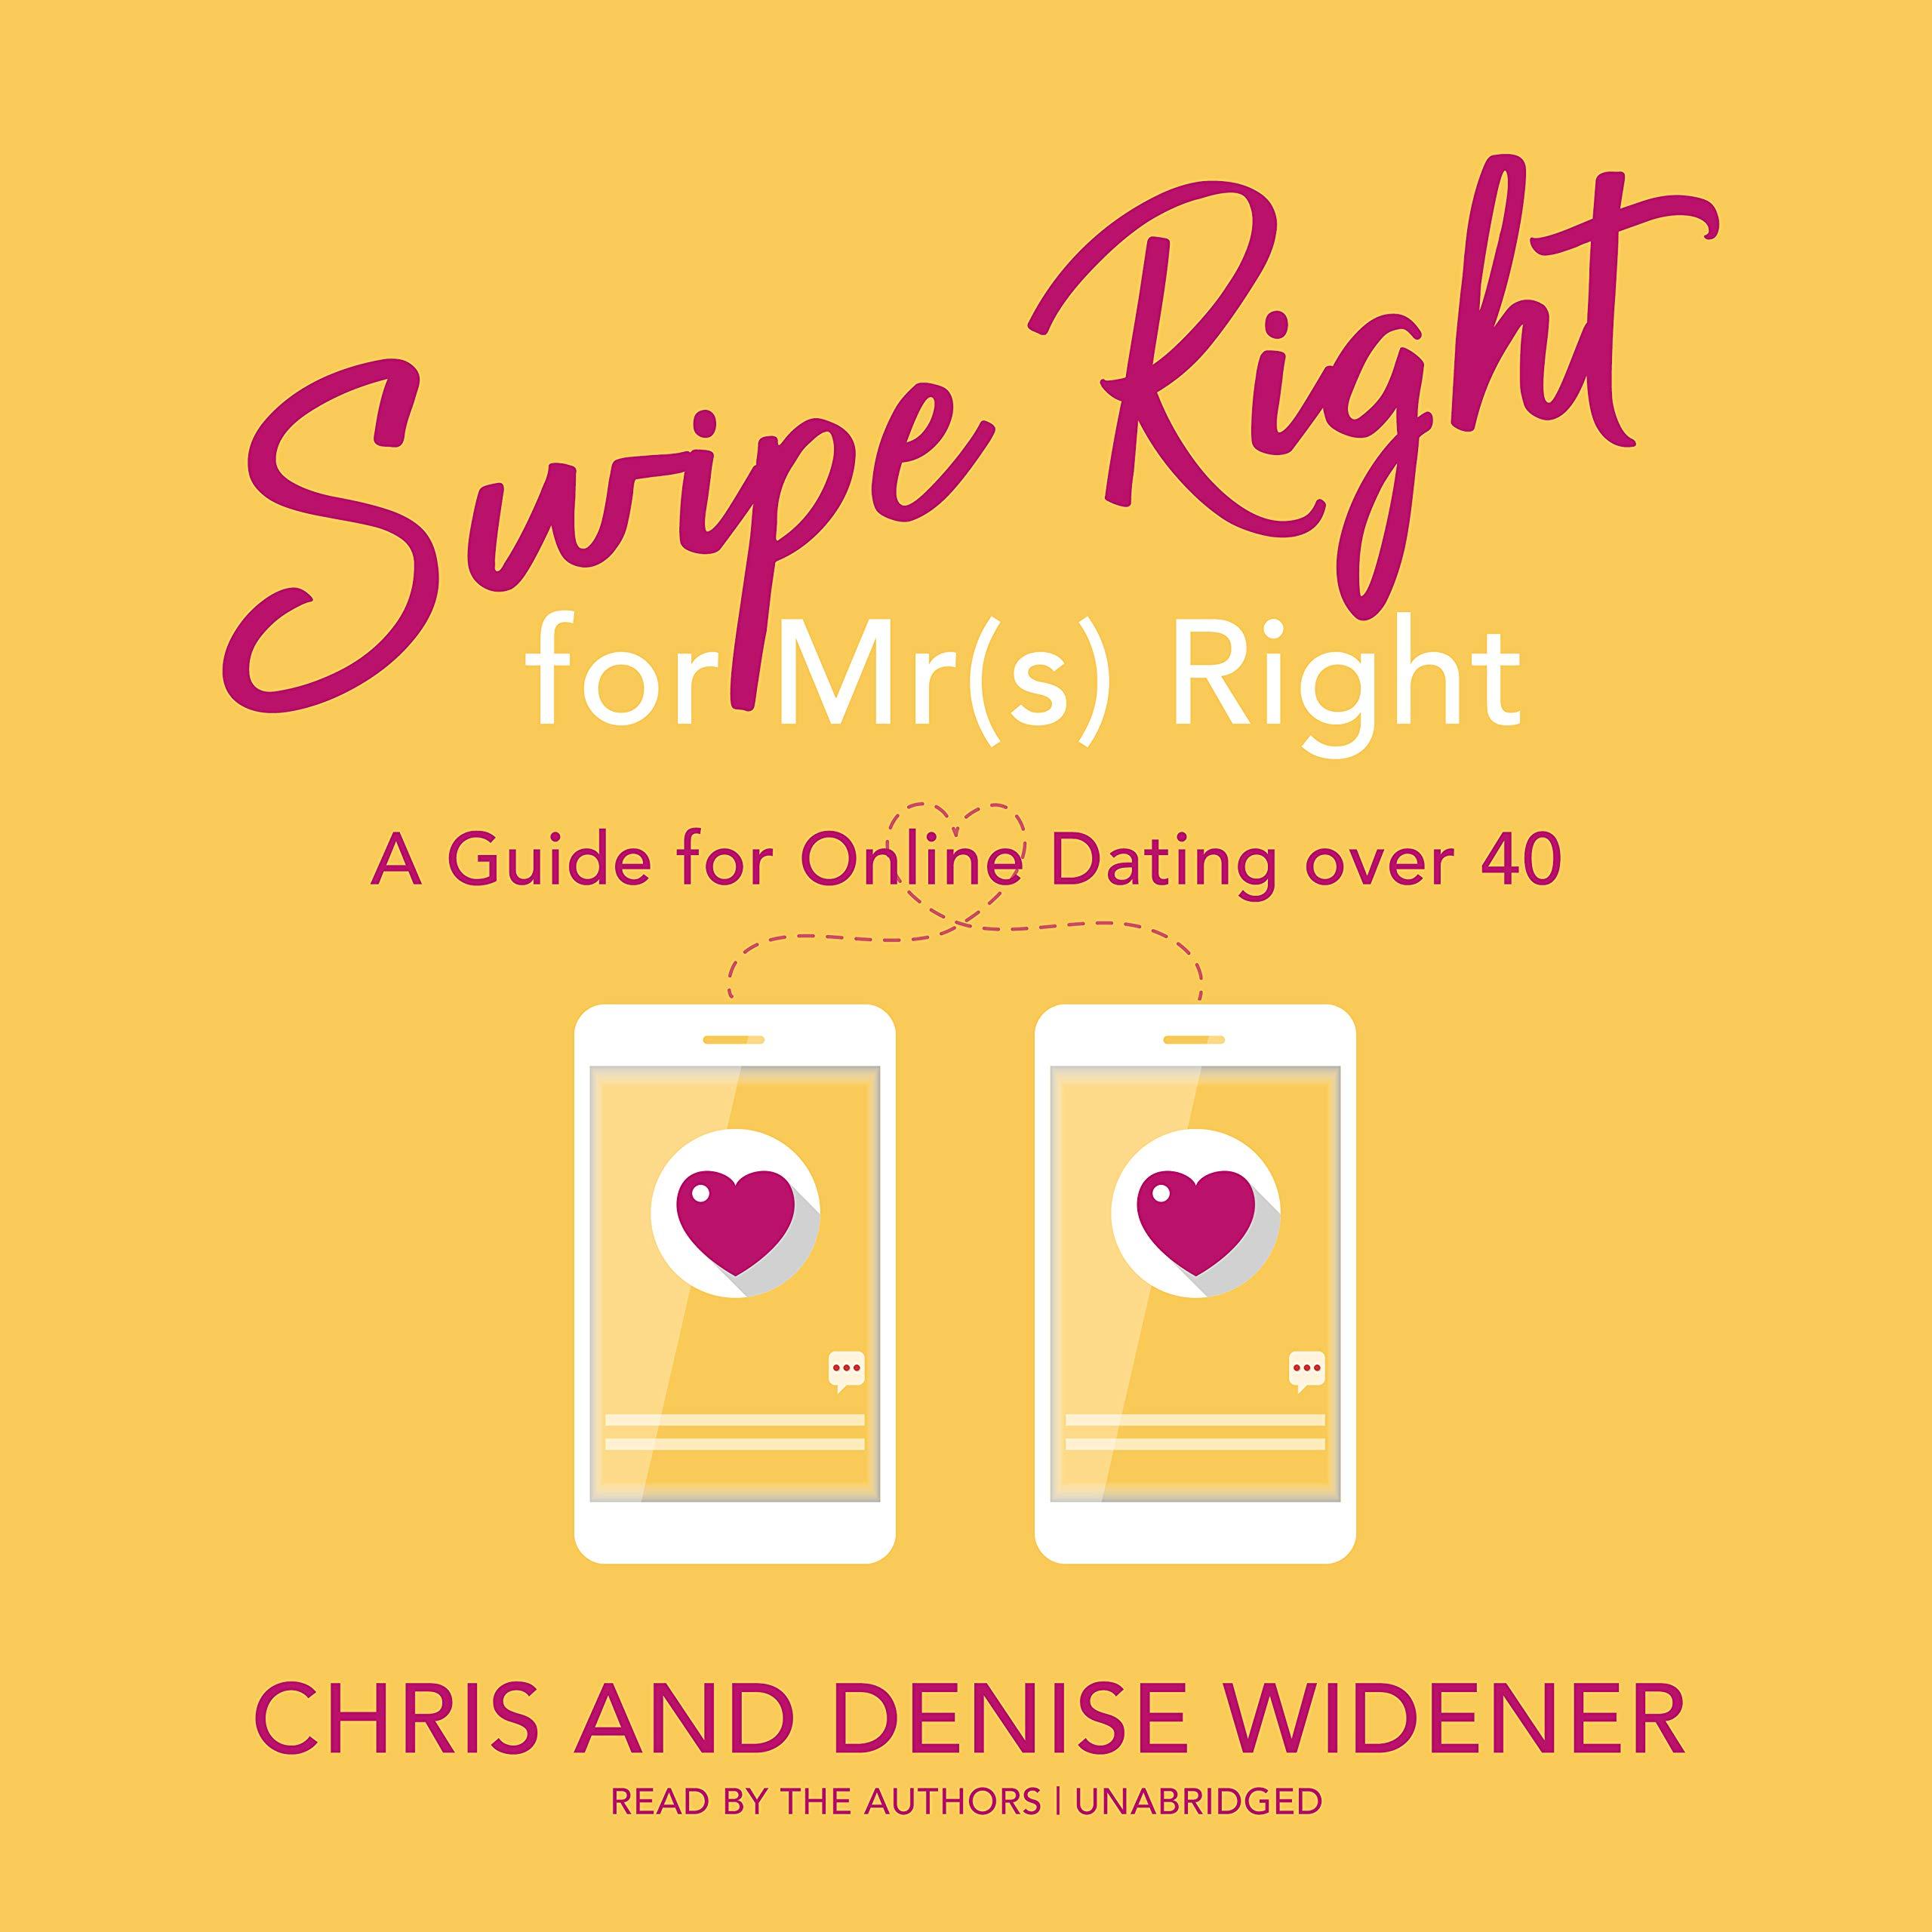 Denise Dating Guide cadets datant enrôlé